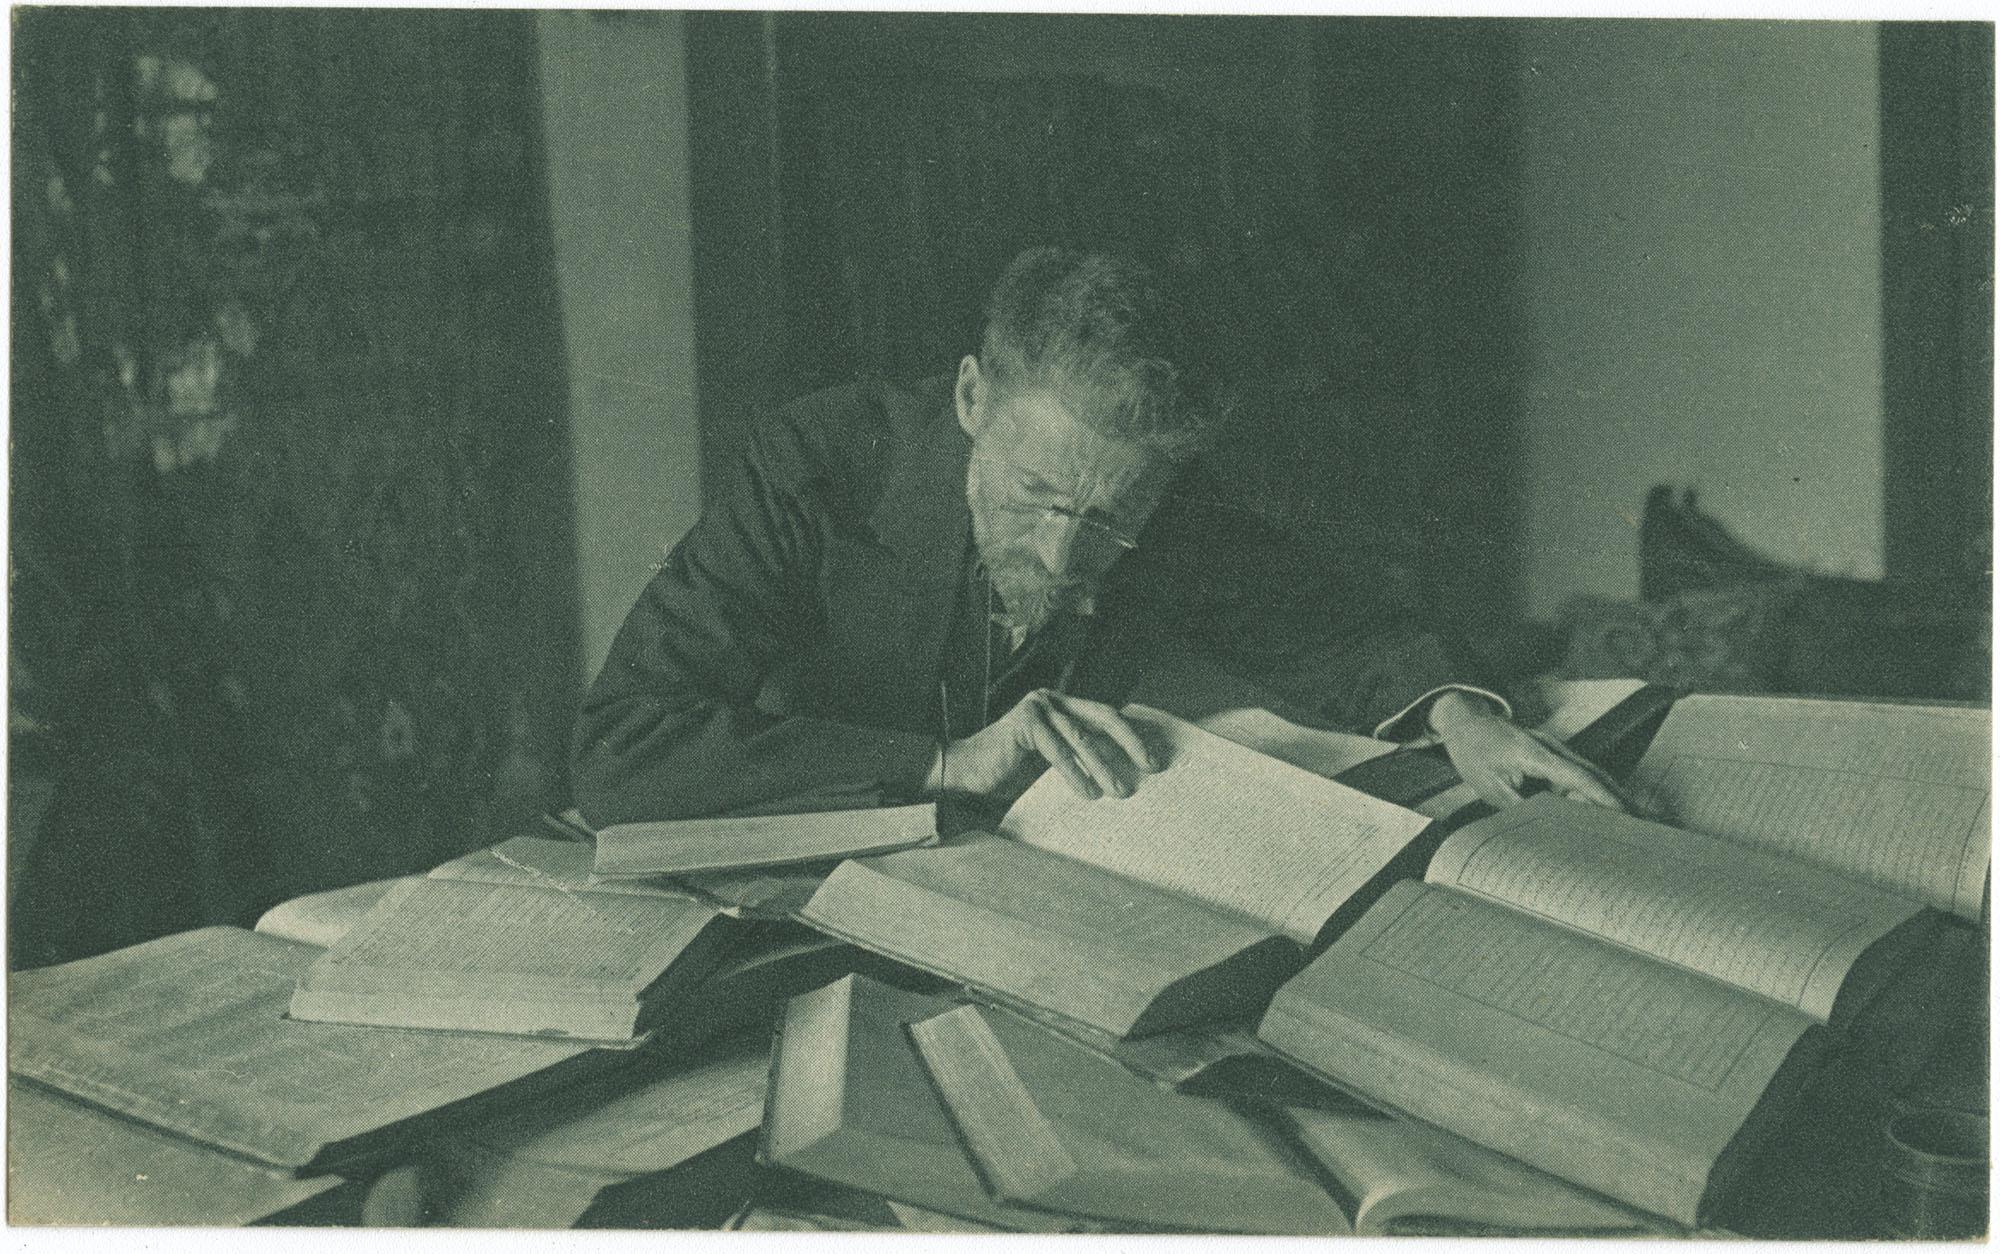 Eliazar Ben-Yehoda, the creater of the Hebrew Encyclopedia / אליעזר בן-יהודה